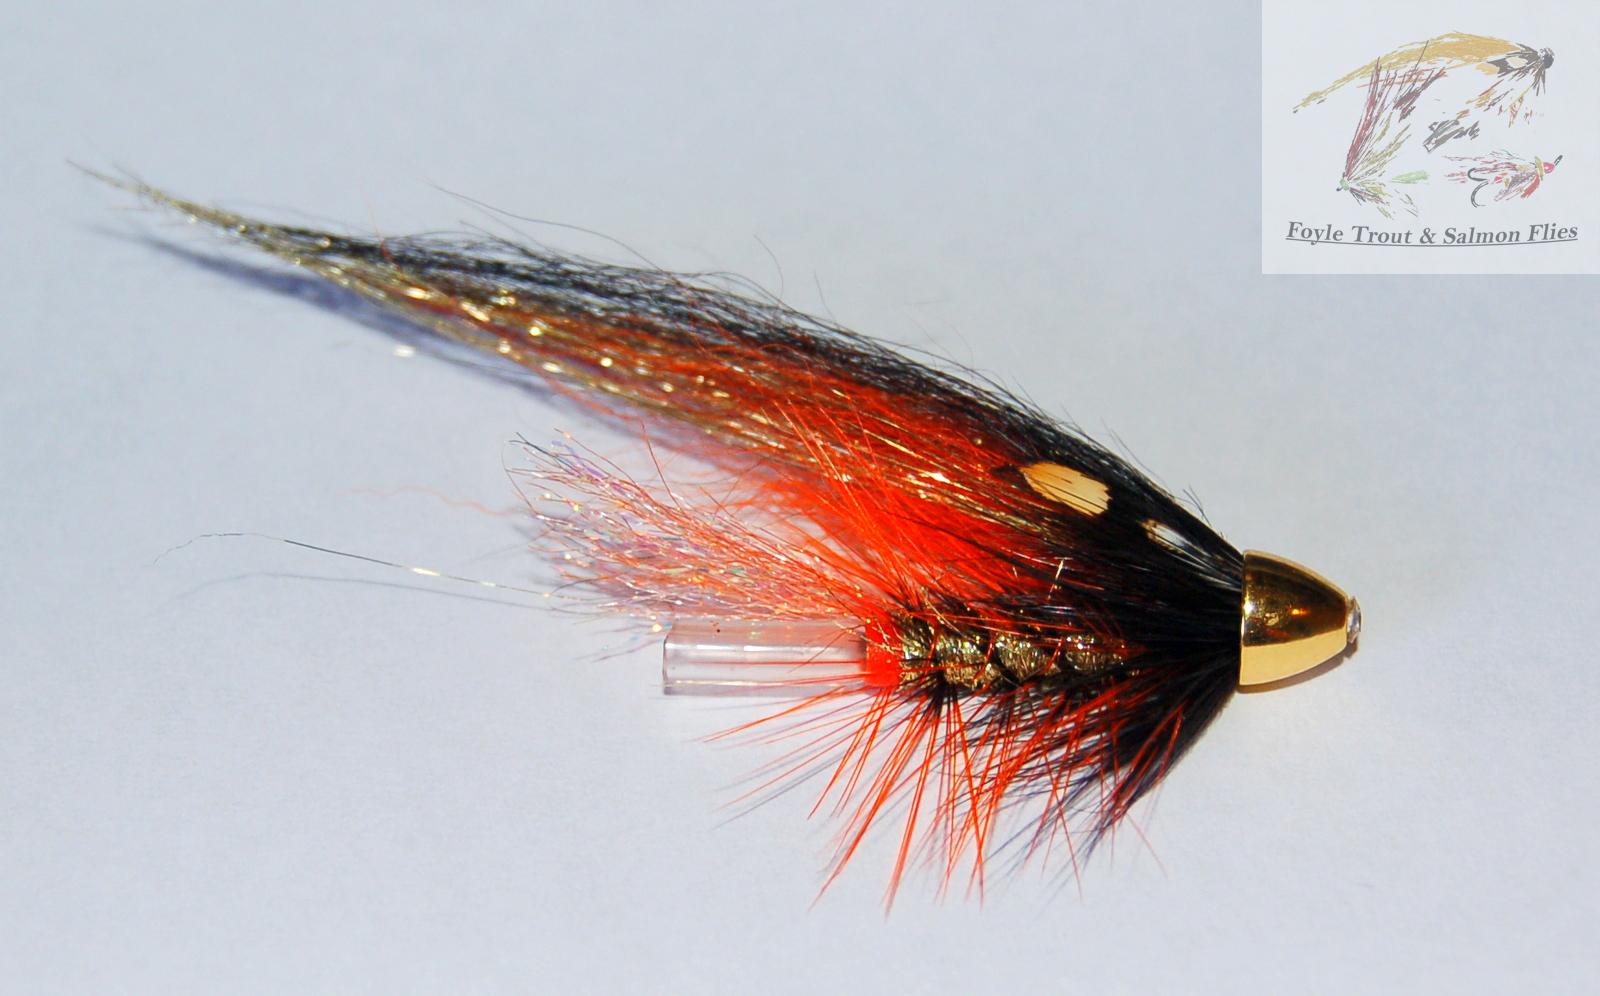 Foyle trout salmon flies temple dog style salmon flies for Salon fly